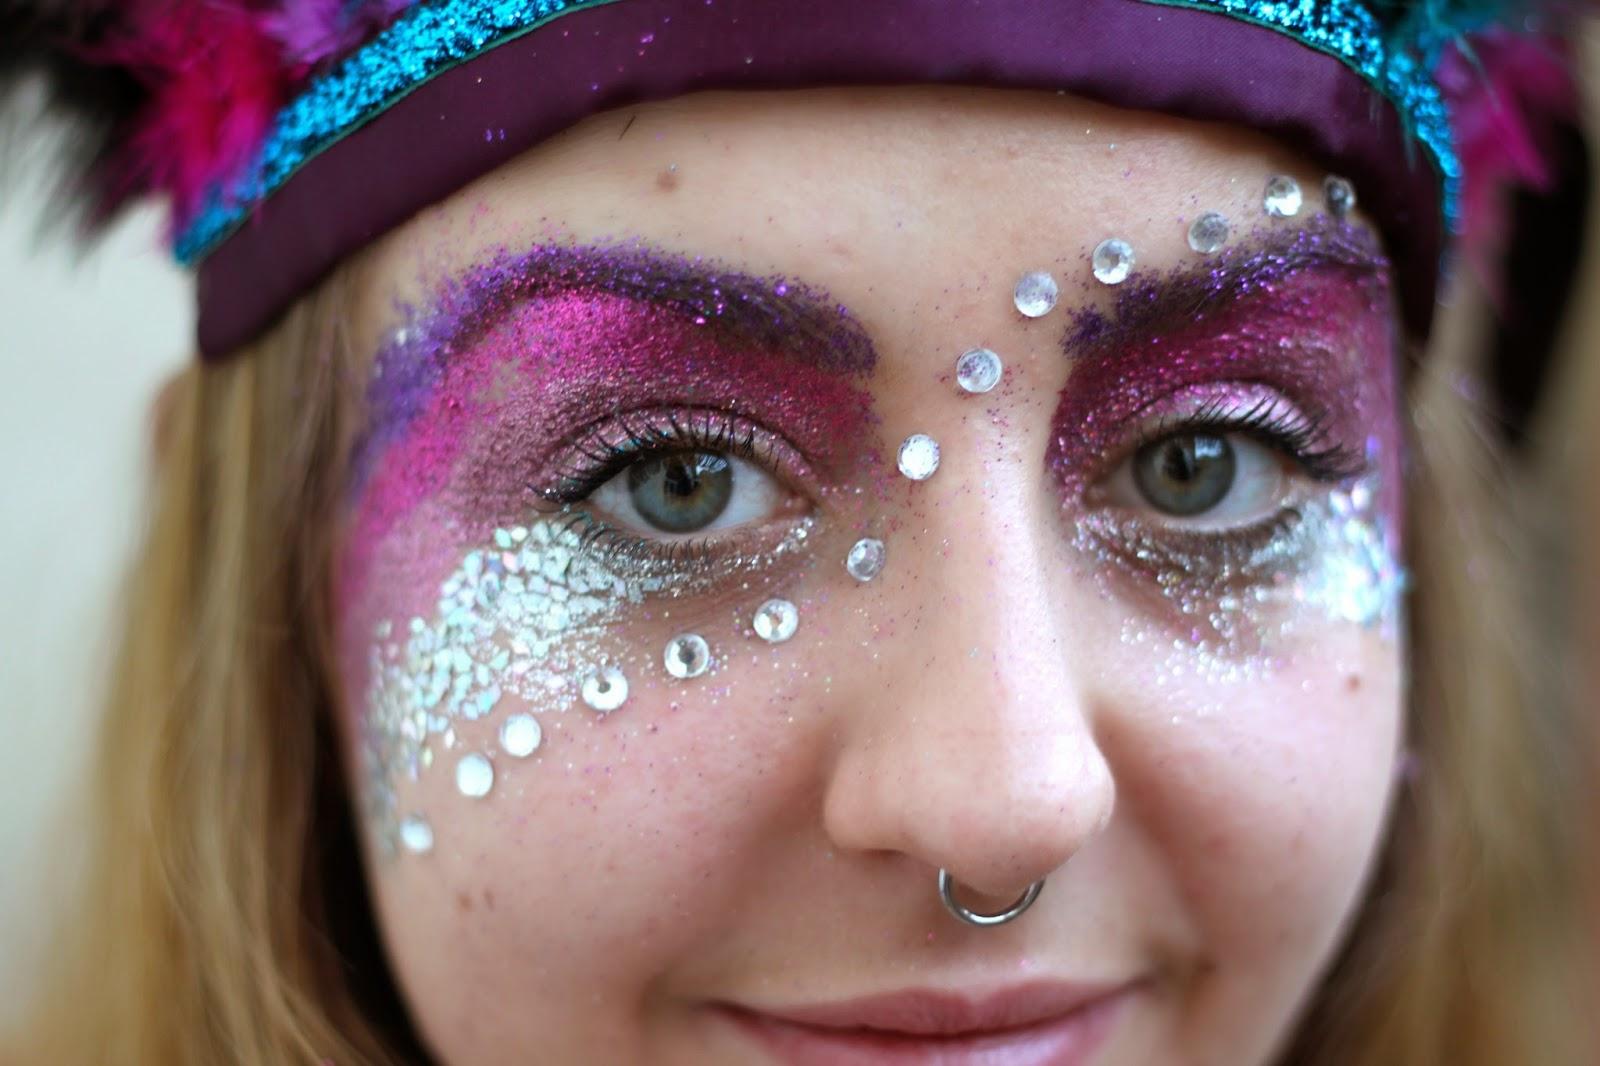 dulcie's feathers, festival, glitter, face paint, festival style, gems, rhinestones, glitter eyebrows